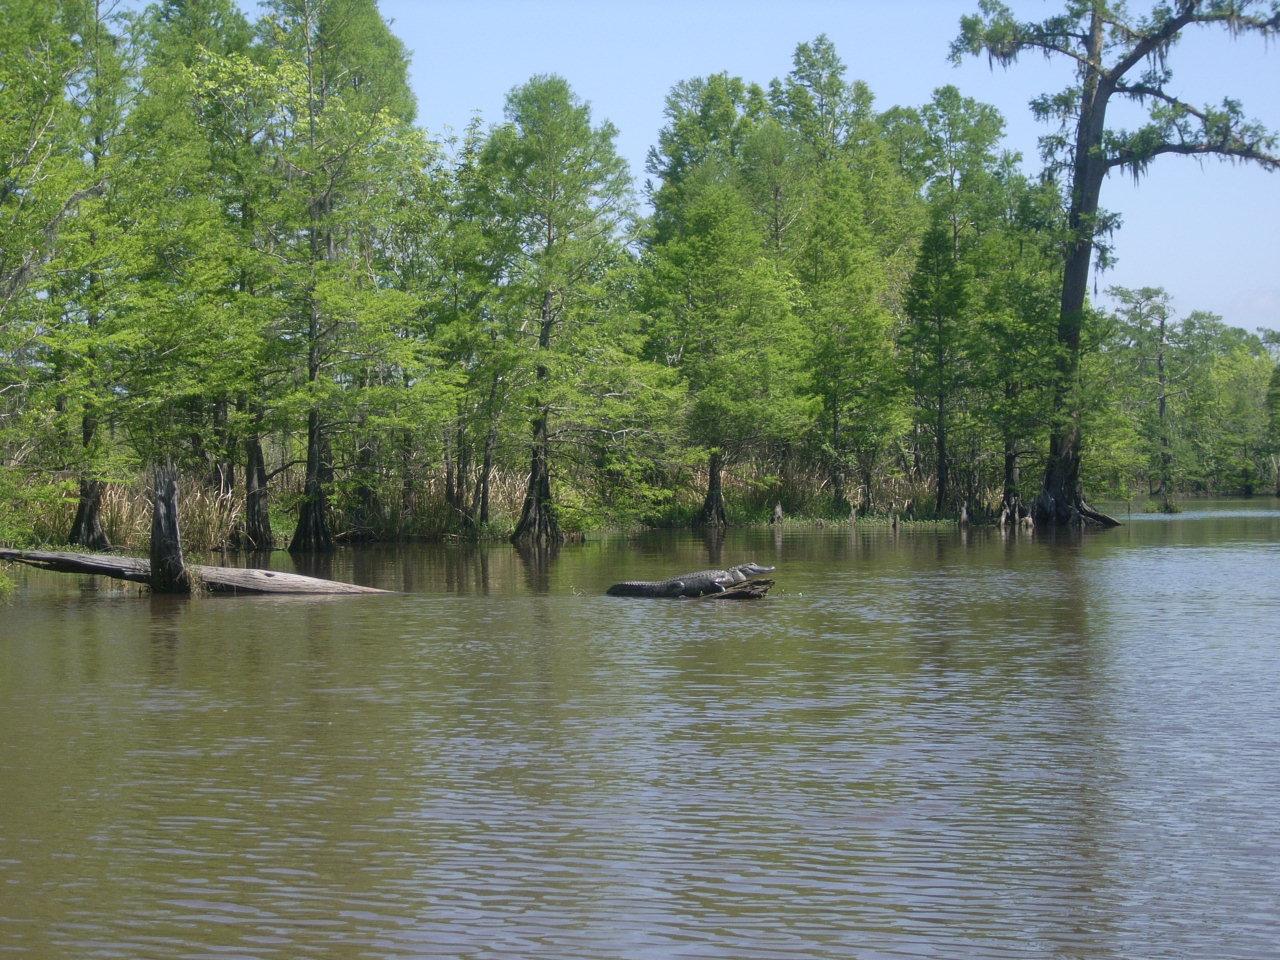 Wetland conservation